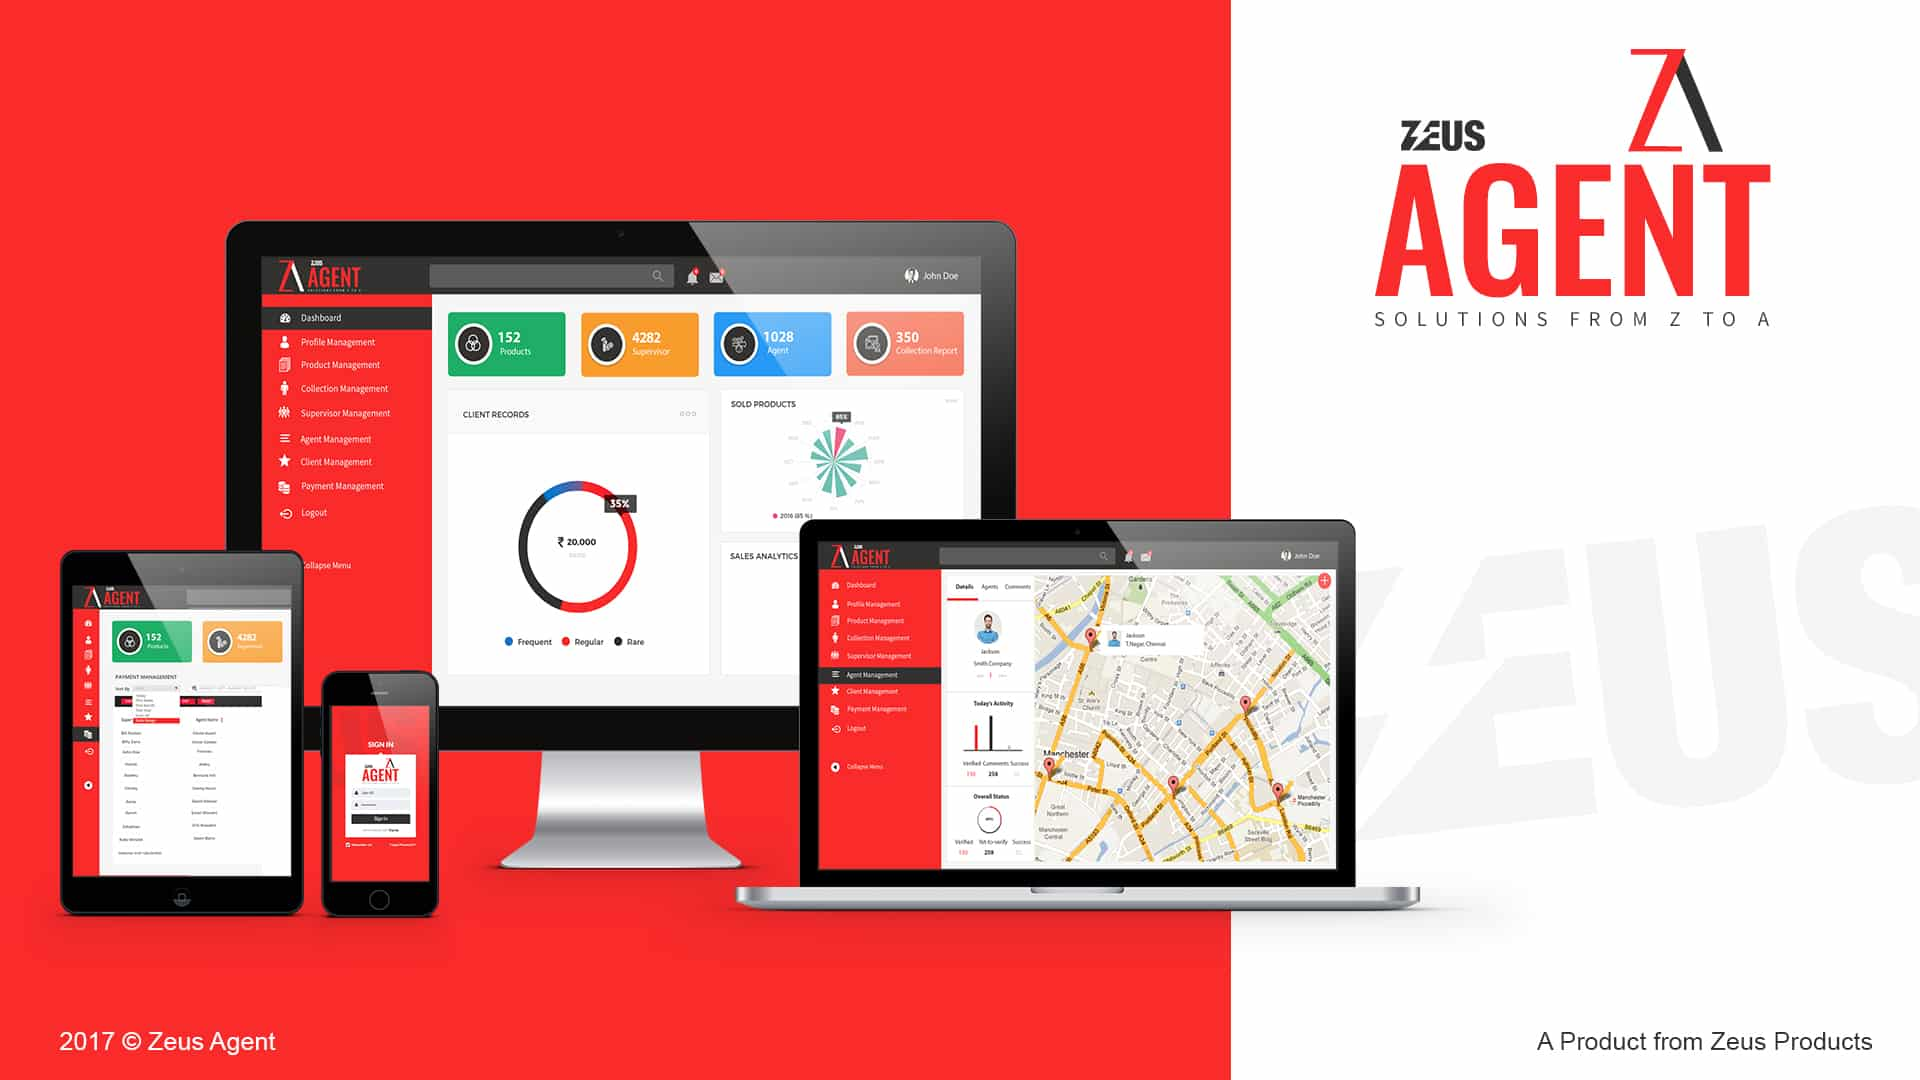 Eibs Zeus Ad agent solutions